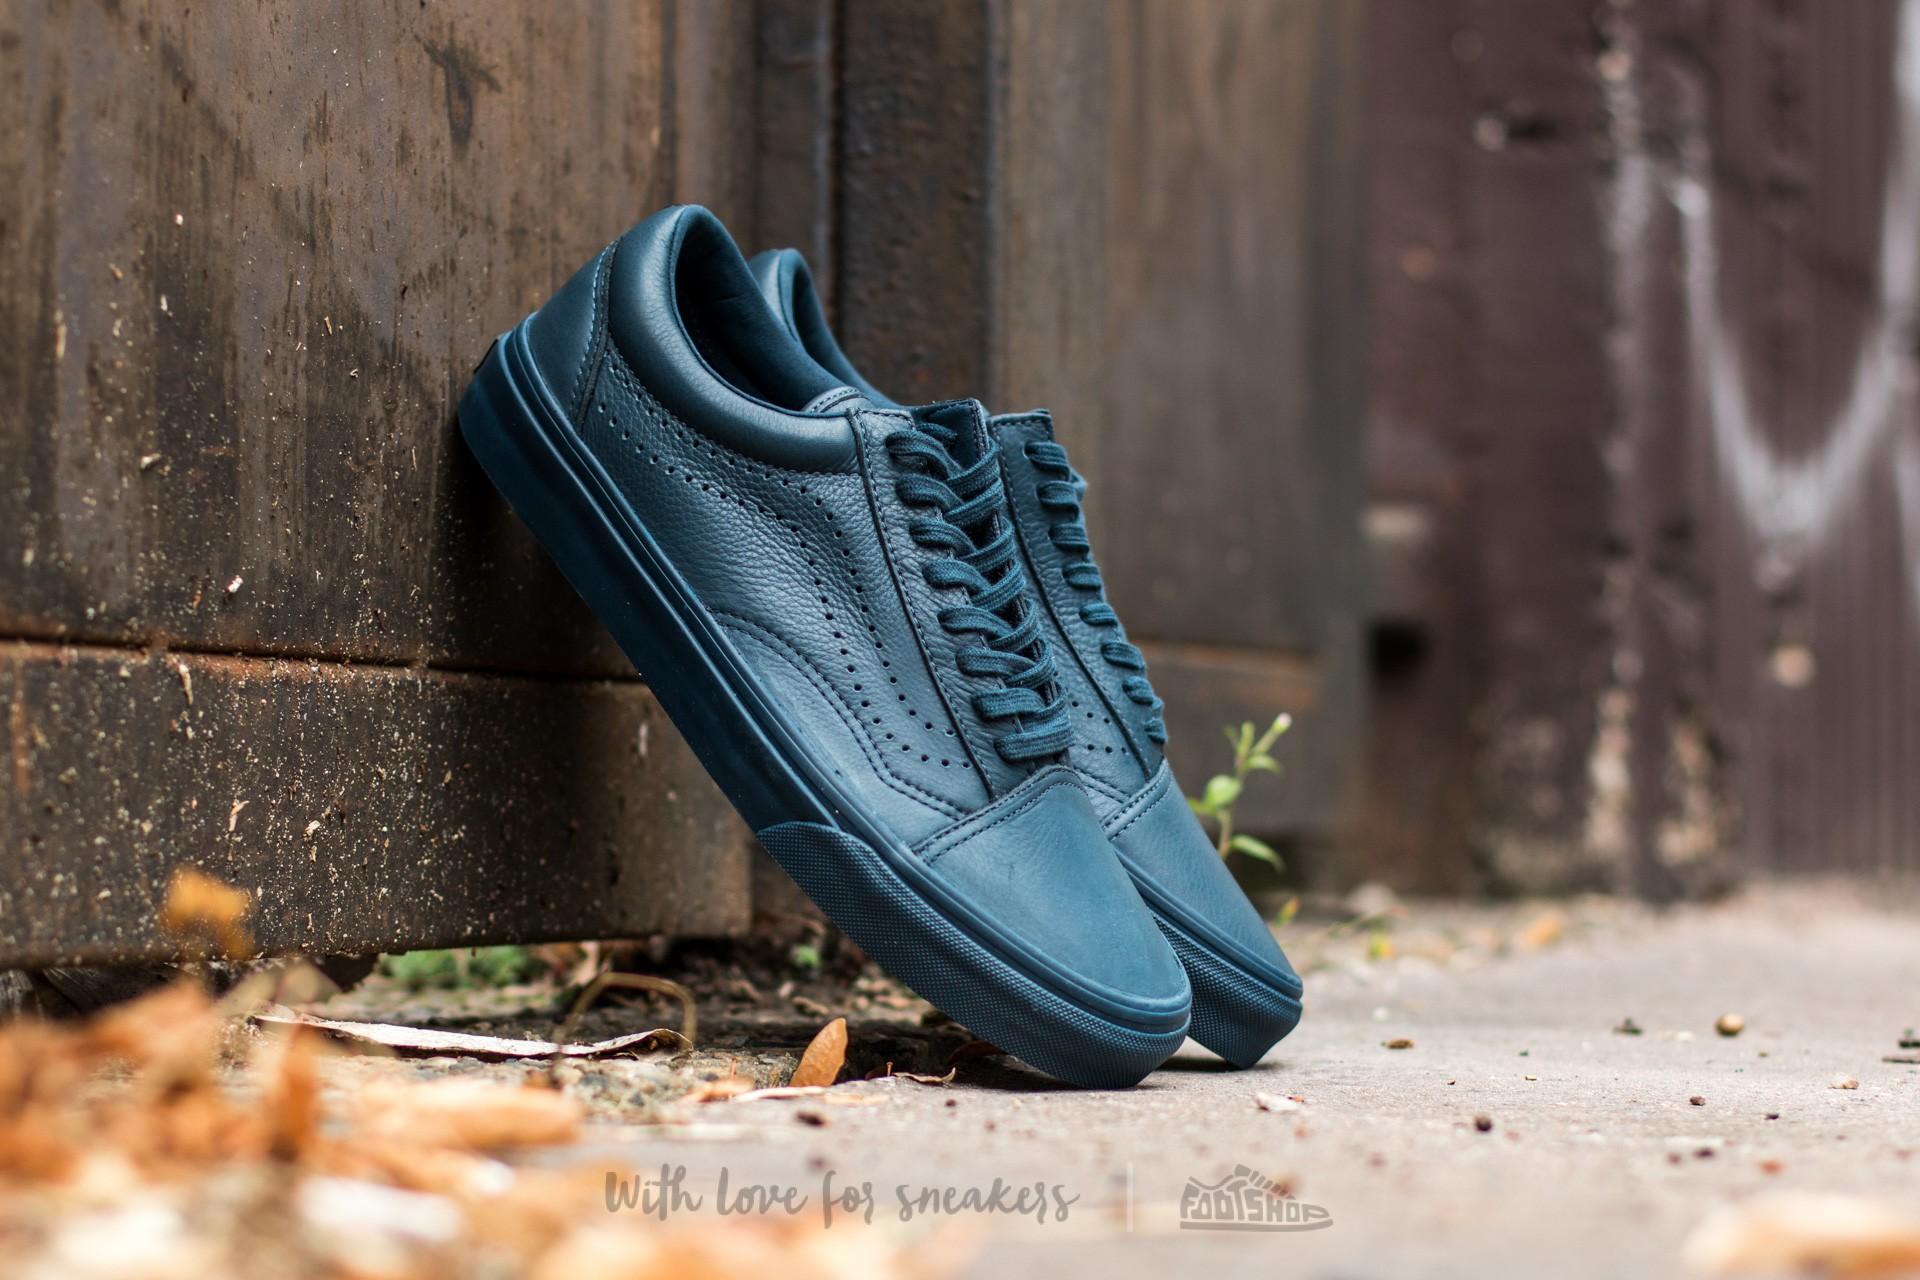 Vans Old Skool Reissue (Leather) Midnight Navy